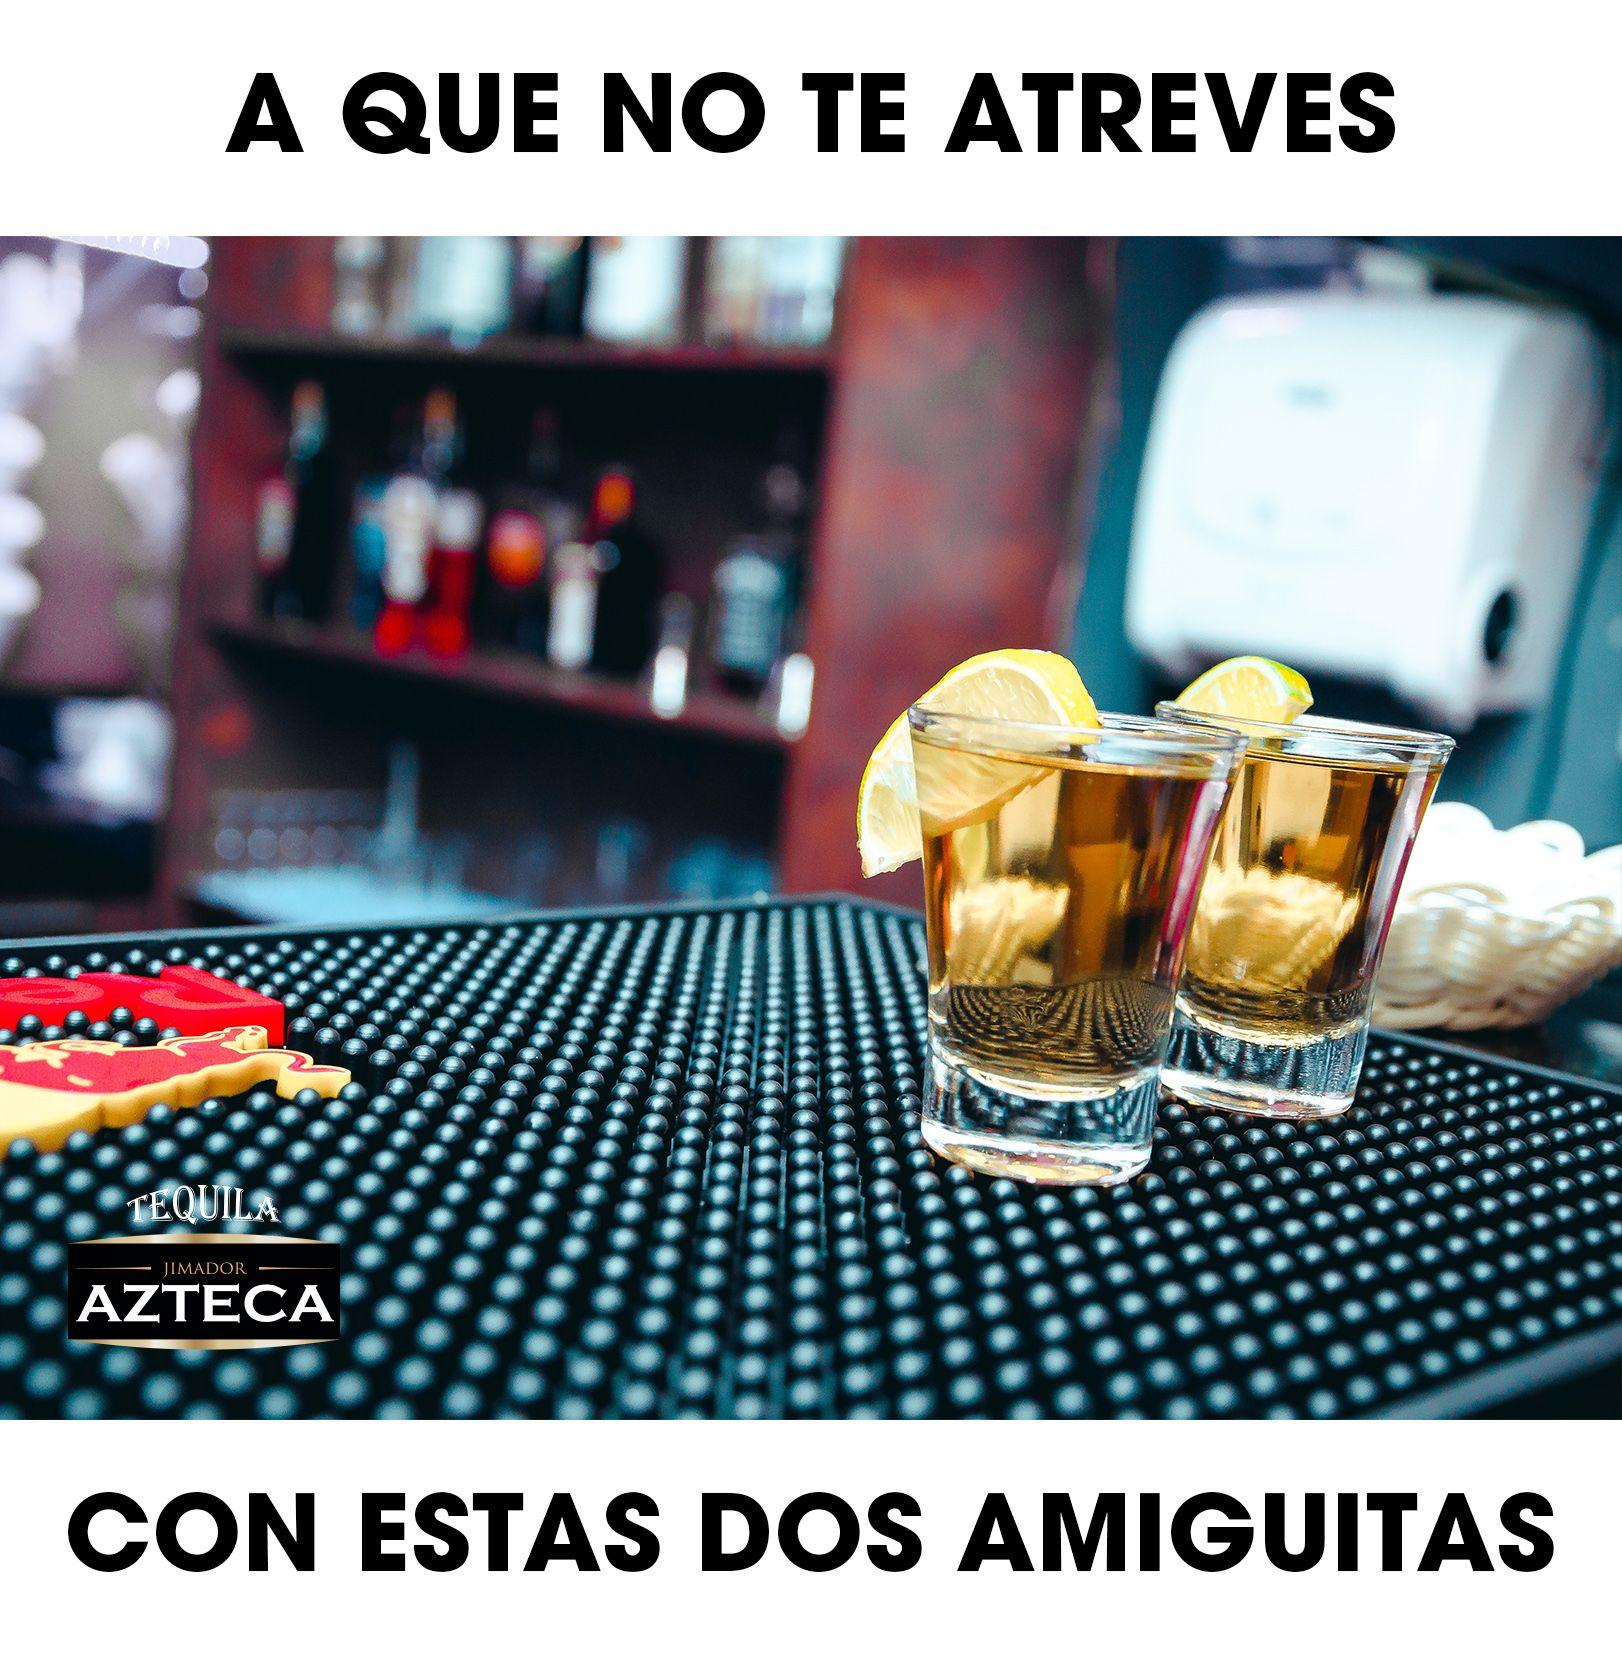 Pin By Jimador Azteca On Tequila Jimador Memes - Pinterest